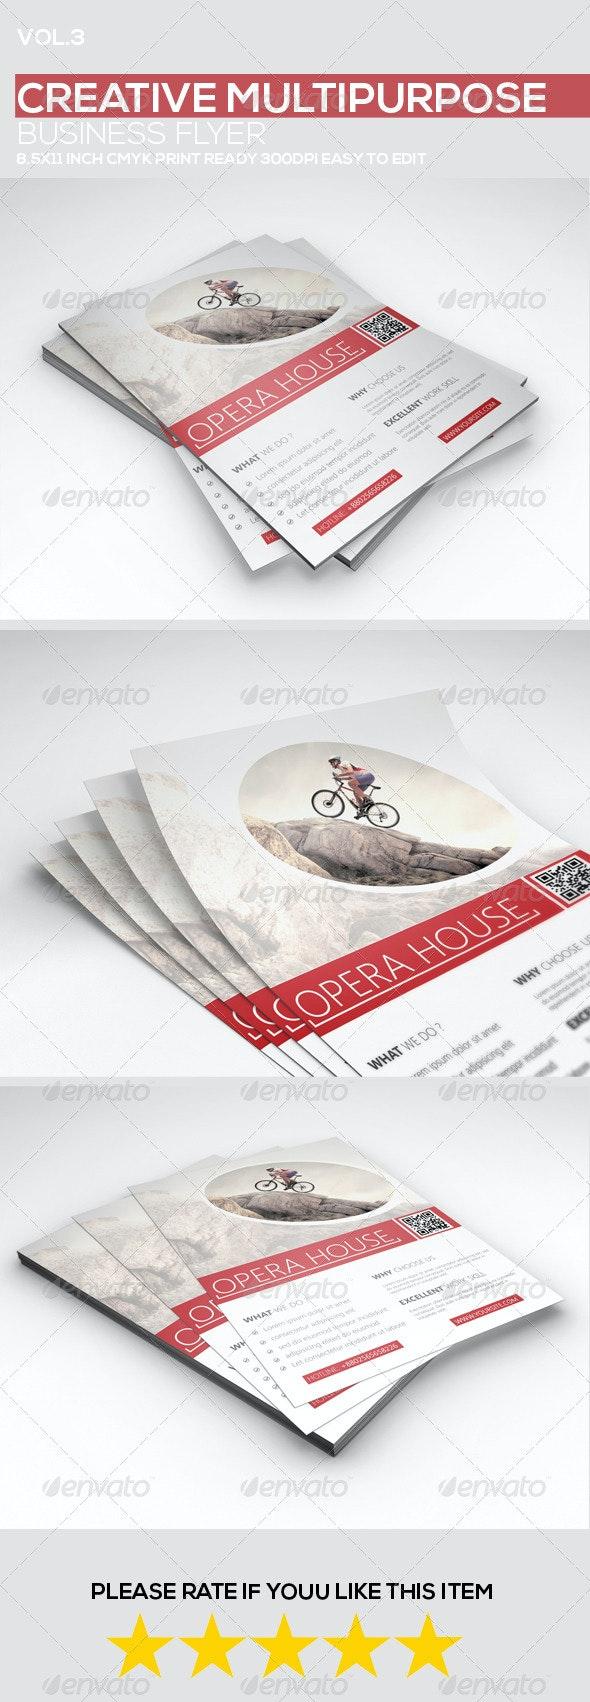 Creative Multipurpose Business Flyer vol.1 - Corporate Flyers